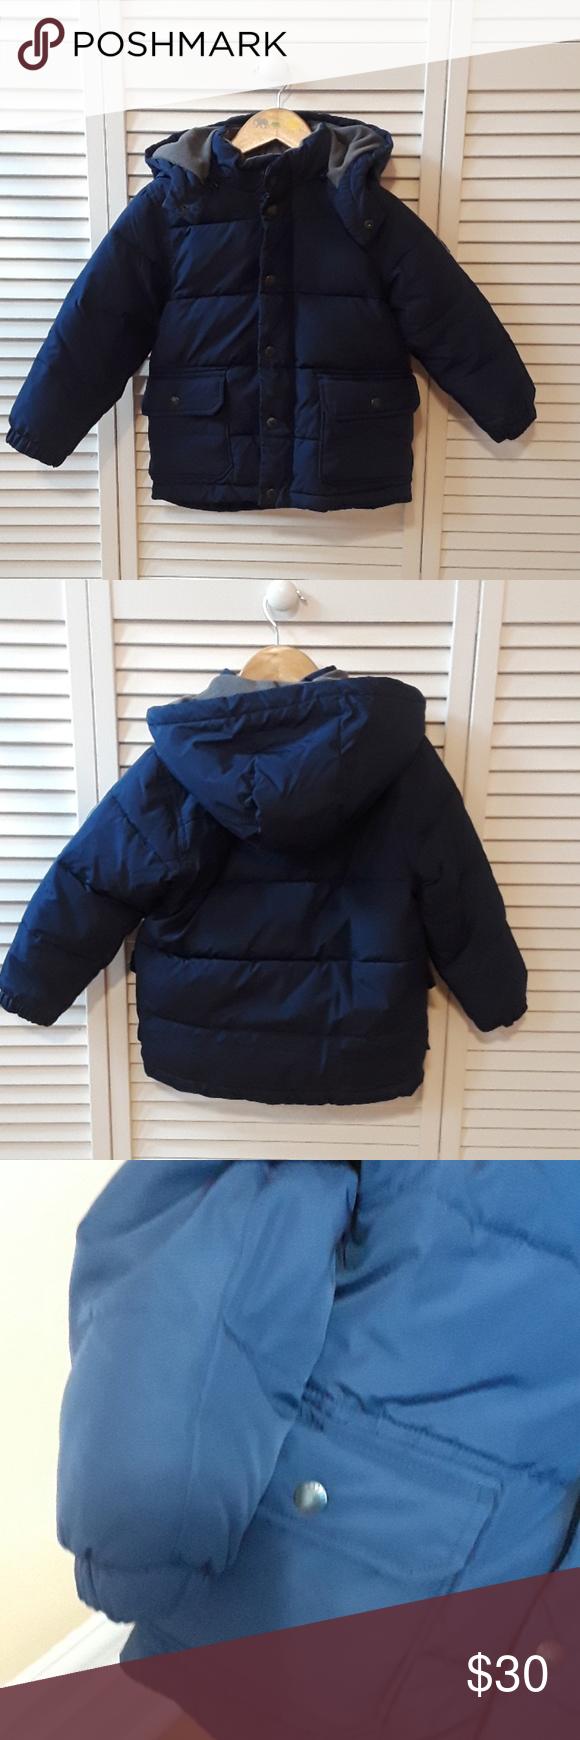 Gap Boys Puffer Jacket Boys Puffer Jacket Clothes Design Fashion Design [ 1740 x 580 Pixel ]